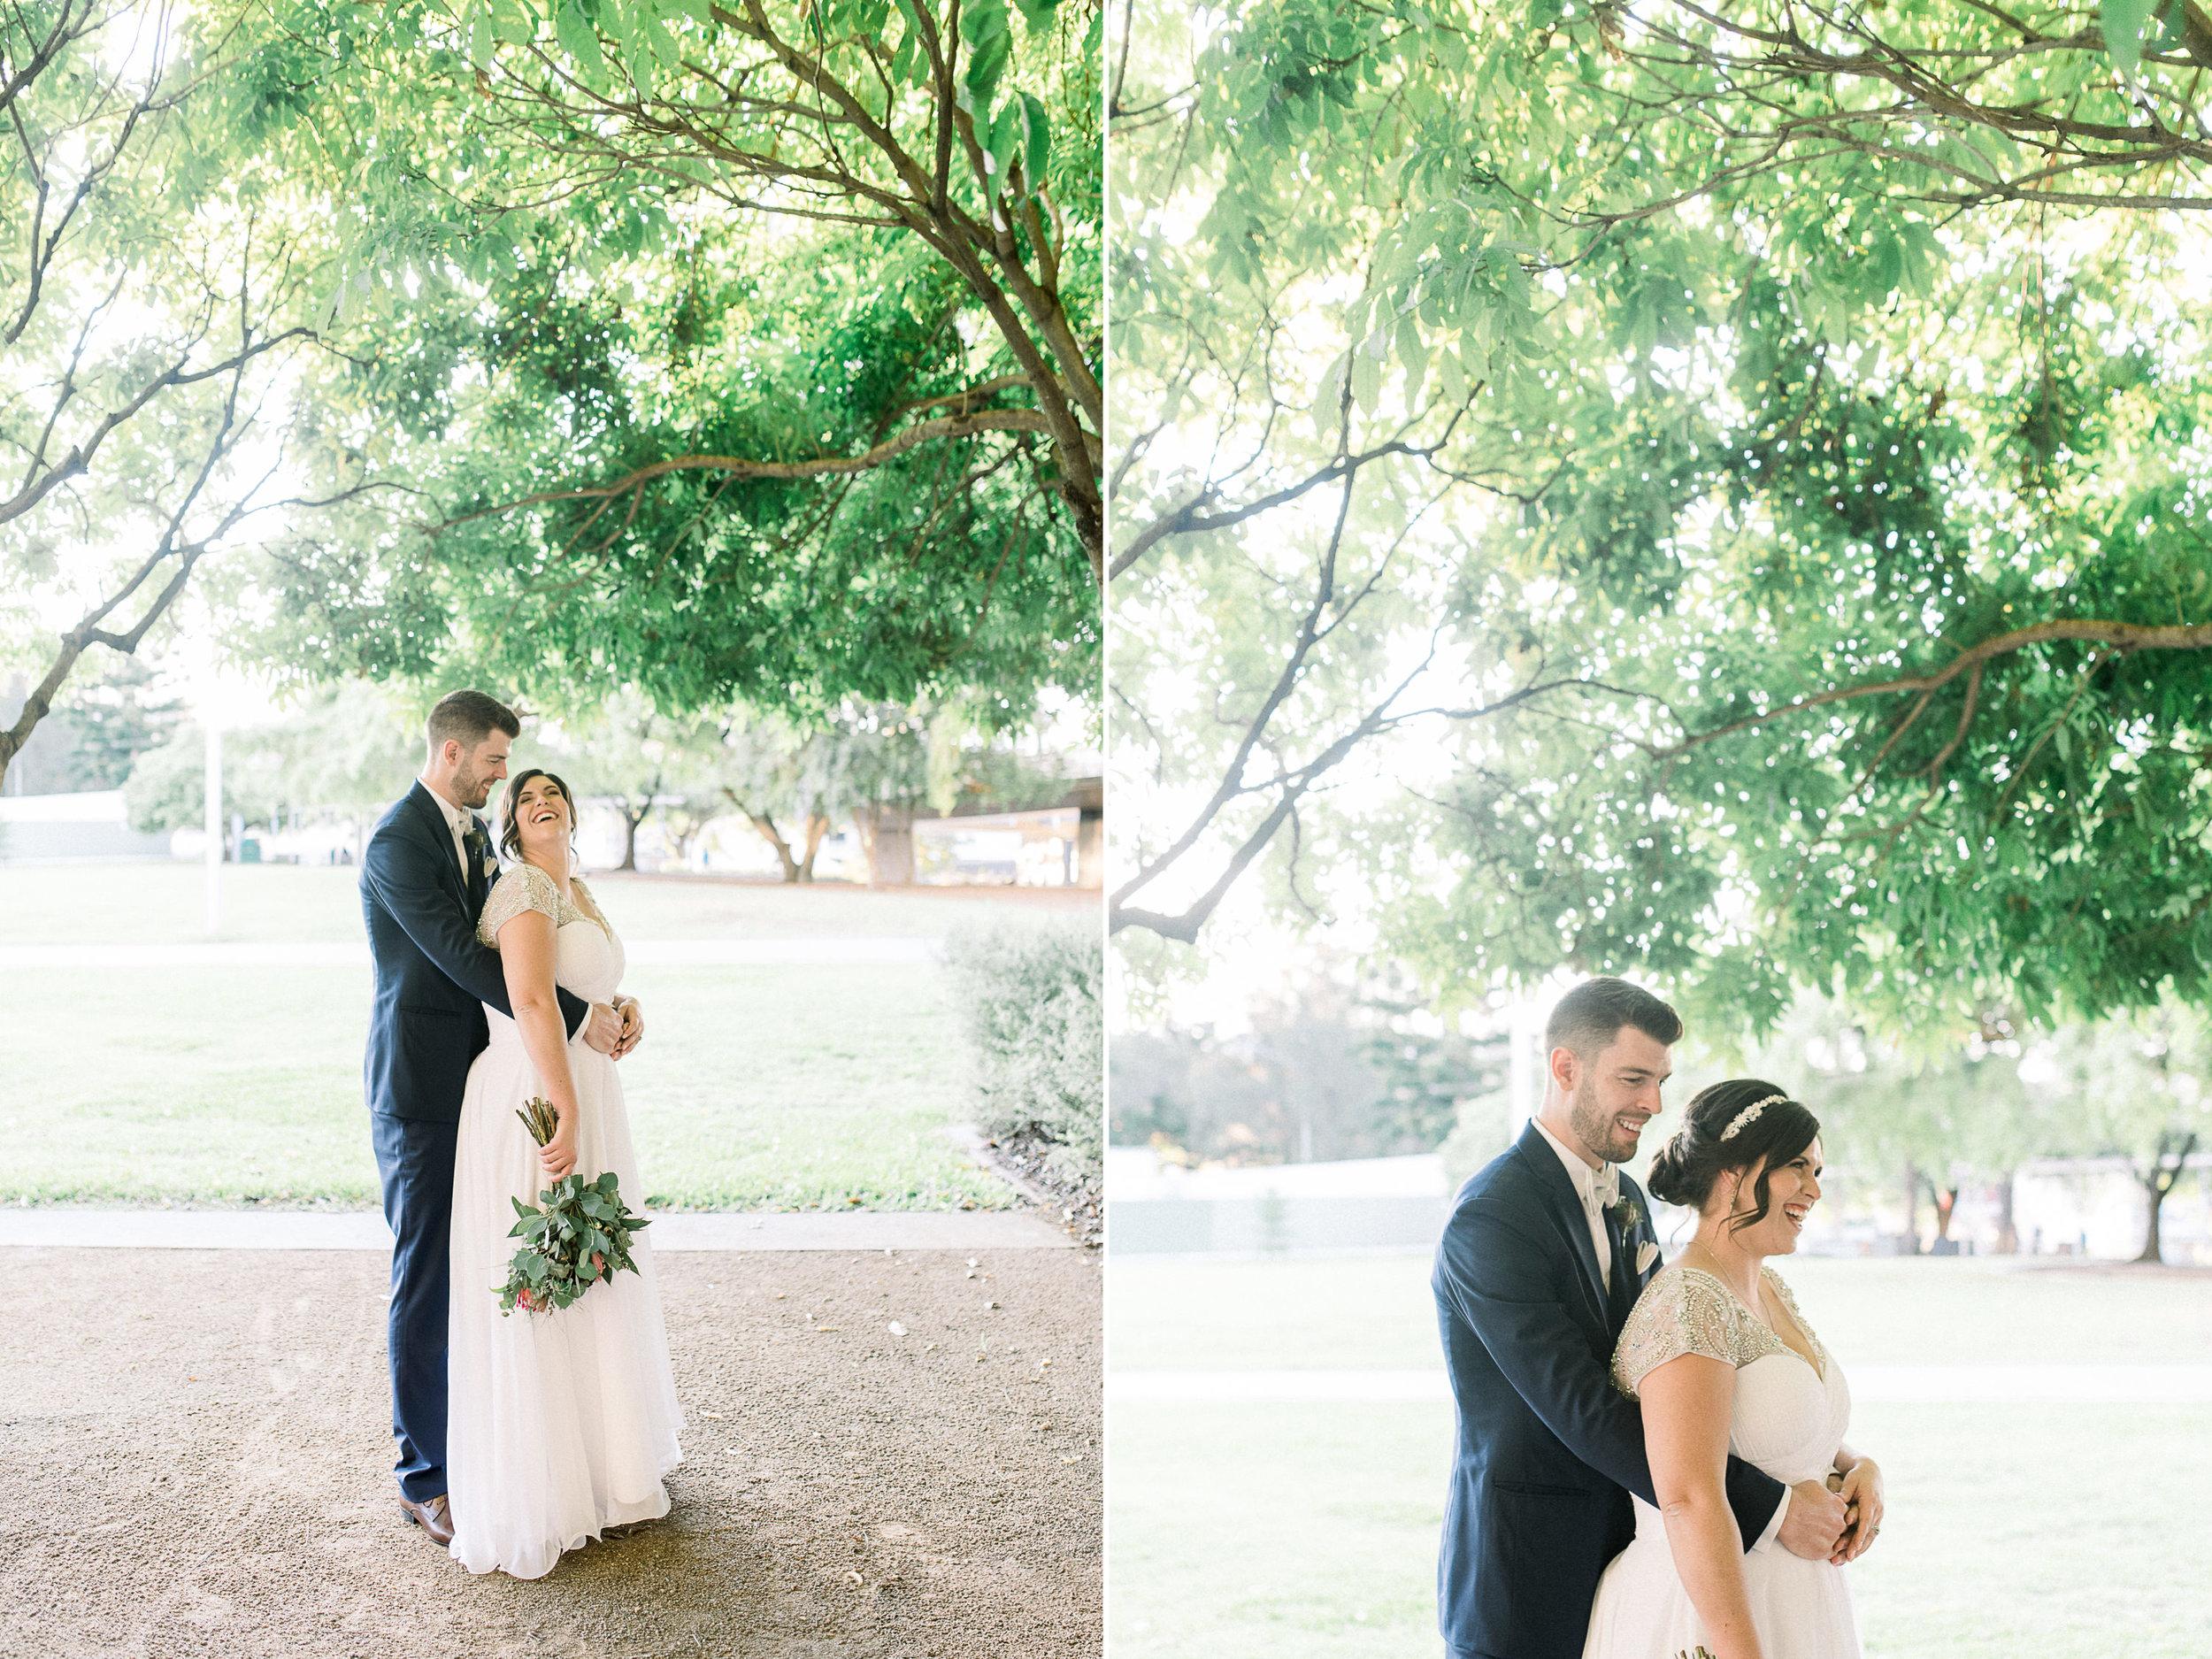 brisbane-city-wedding-photography-film-light-beautiful-1.jpg